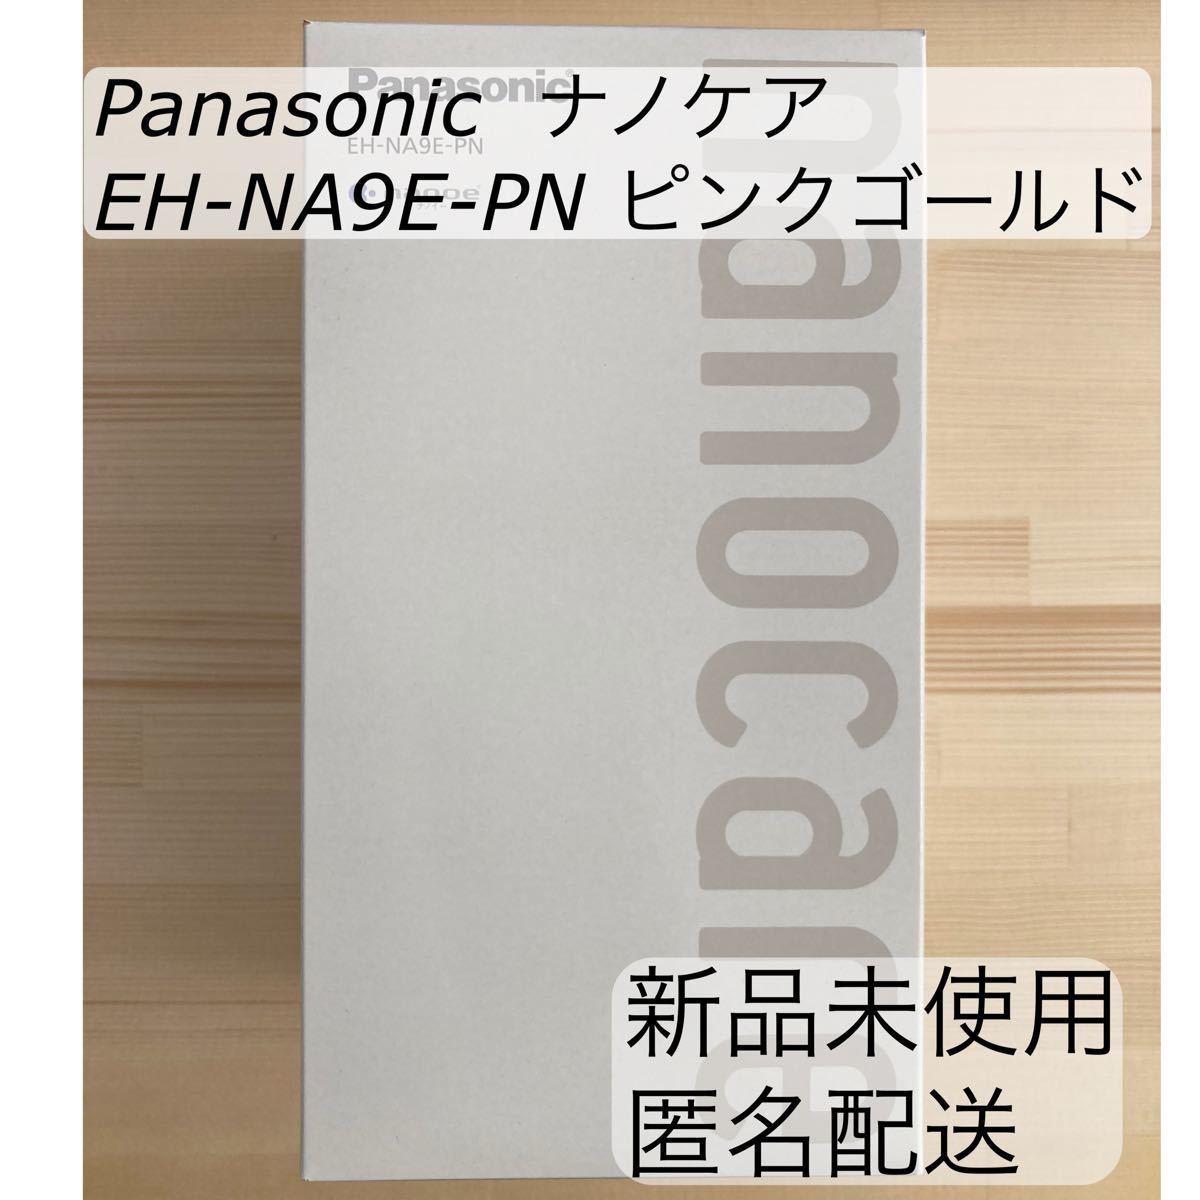 Panasonic パナソニック ナノケア EH-NA9E-PN ピンクゴールド